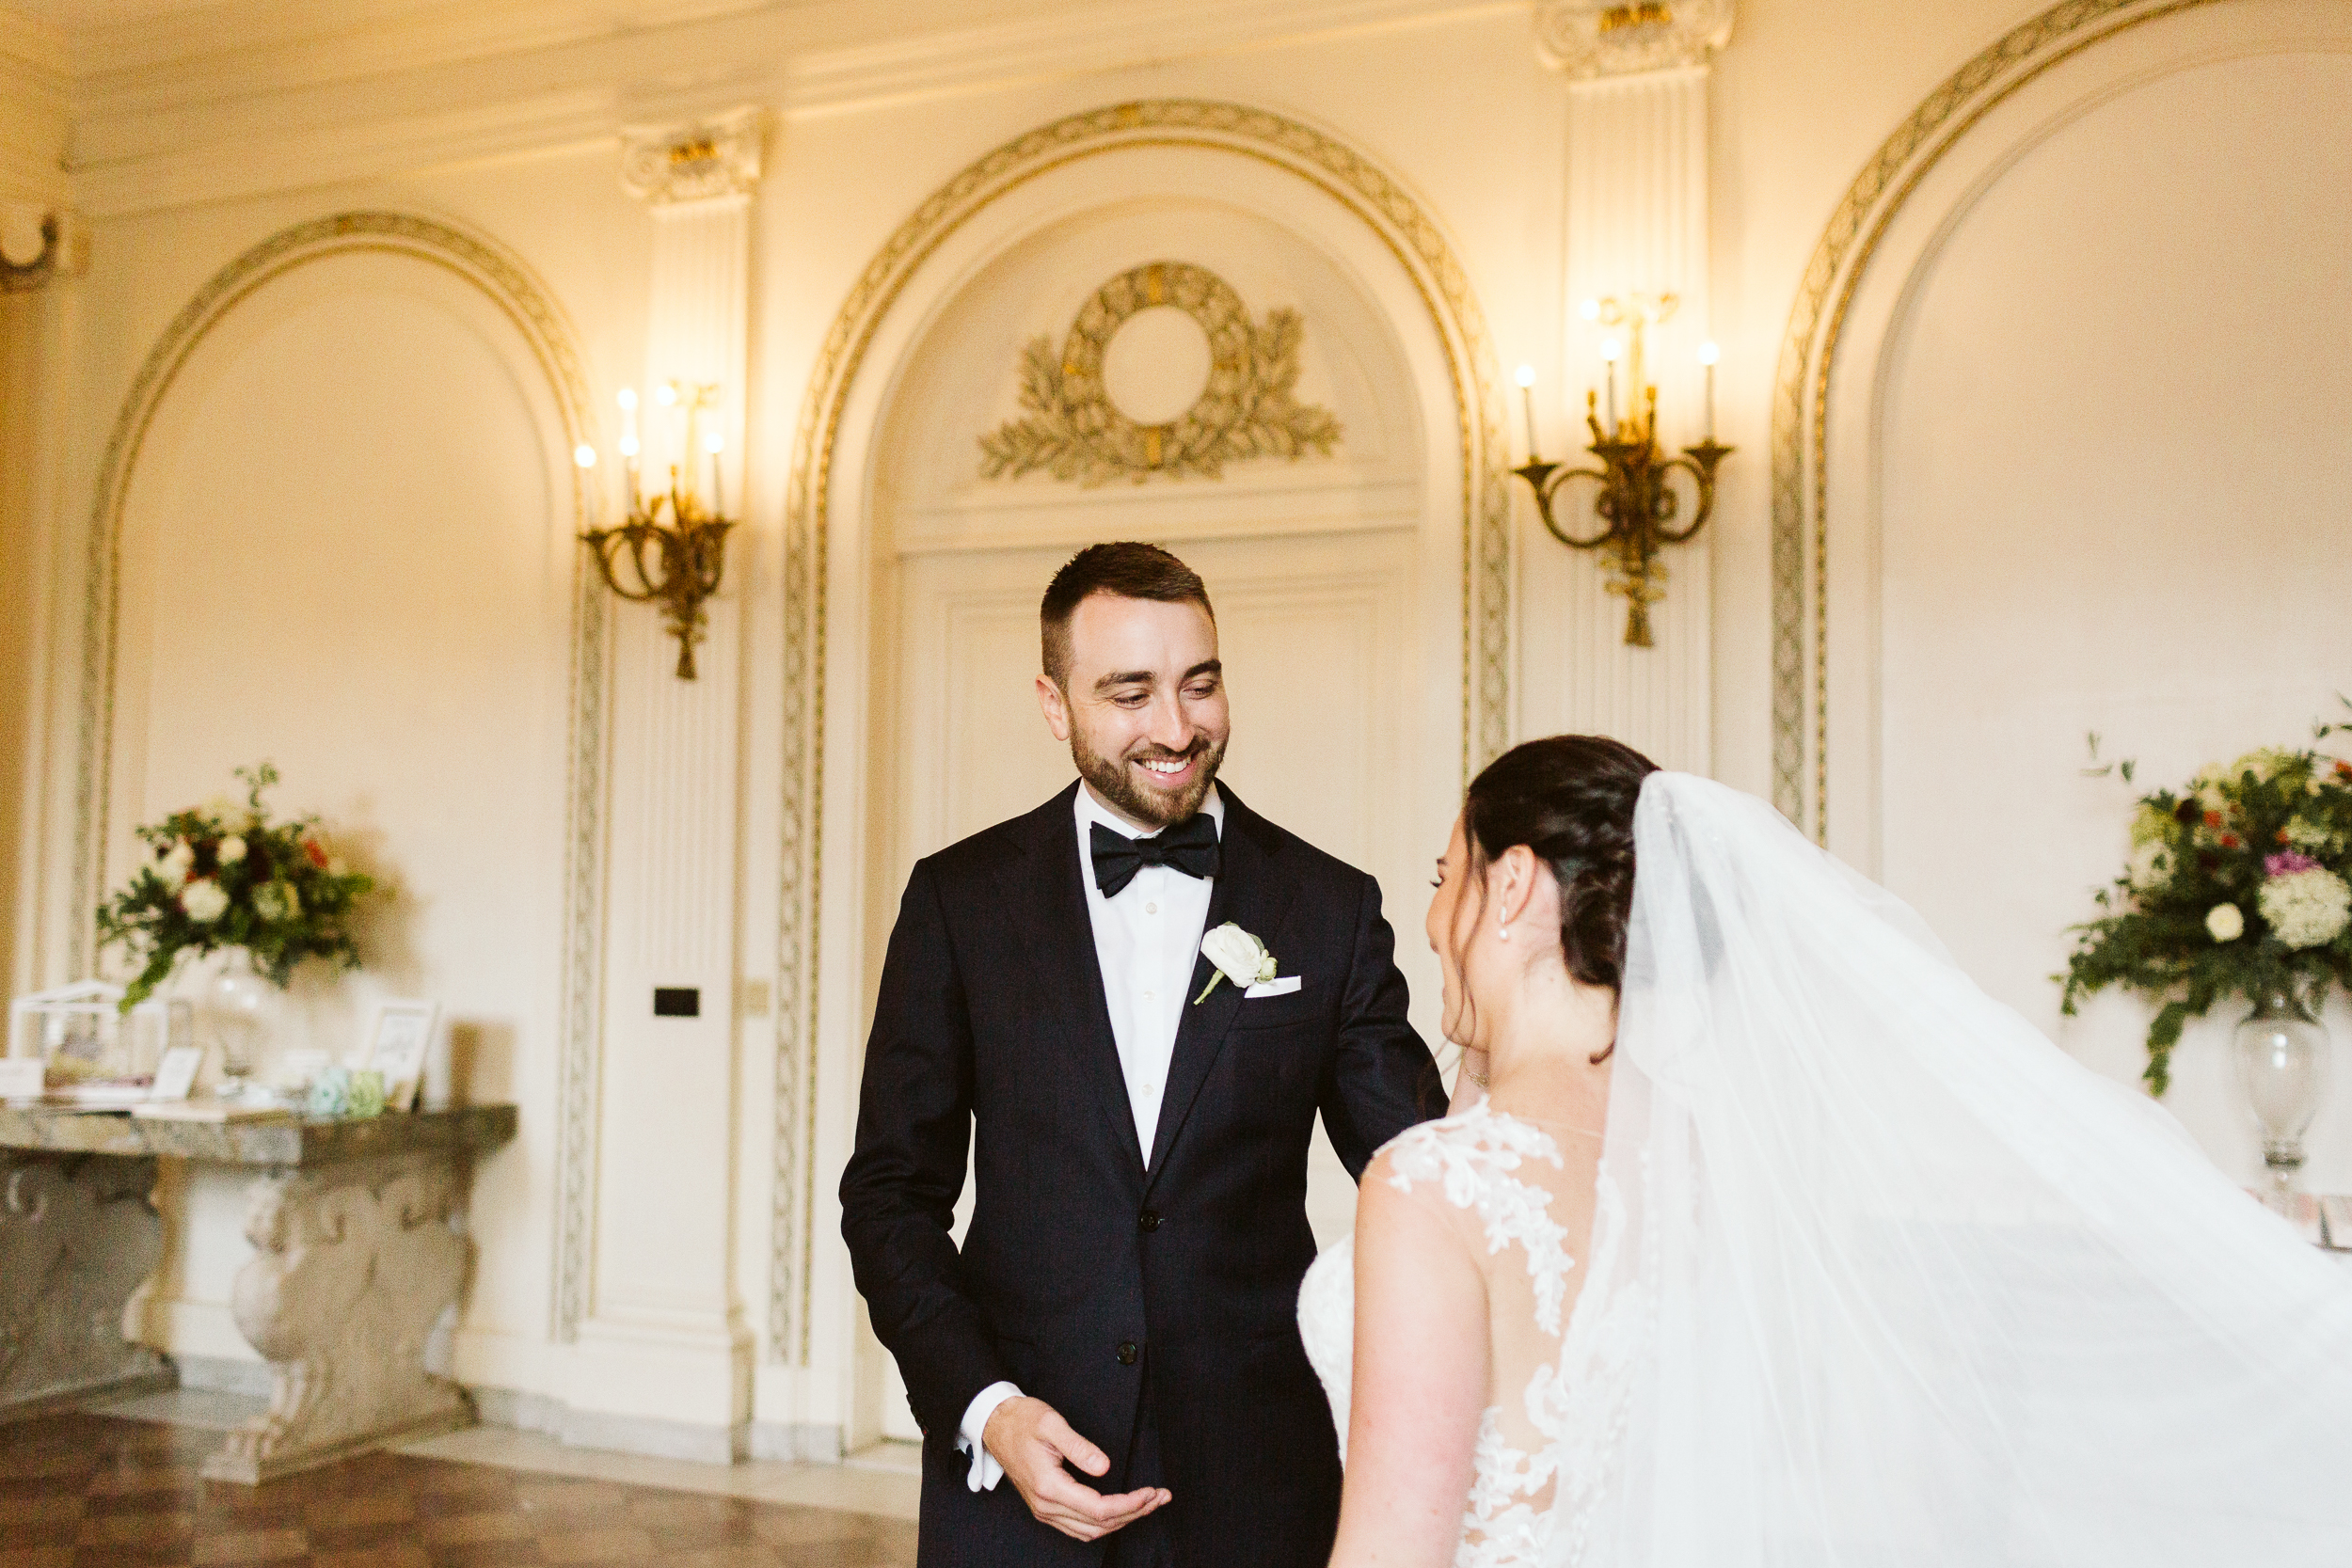 tupper-manor-wedding-photos-0018.JPG